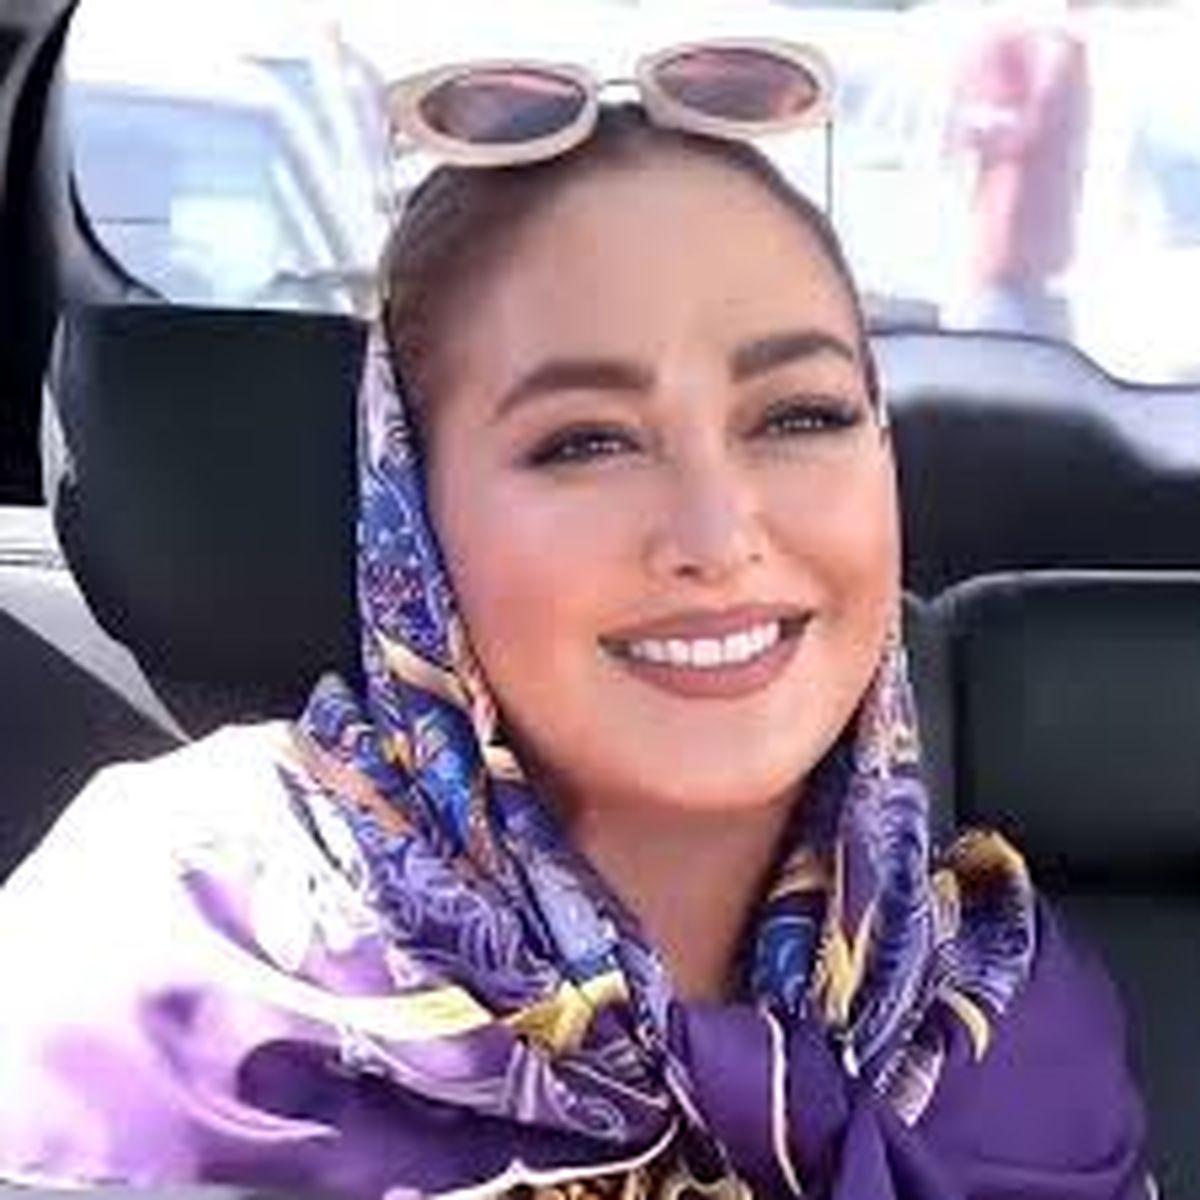 علت اصلی طلاق الهام حمیدی فاش شد + عکس همسرش